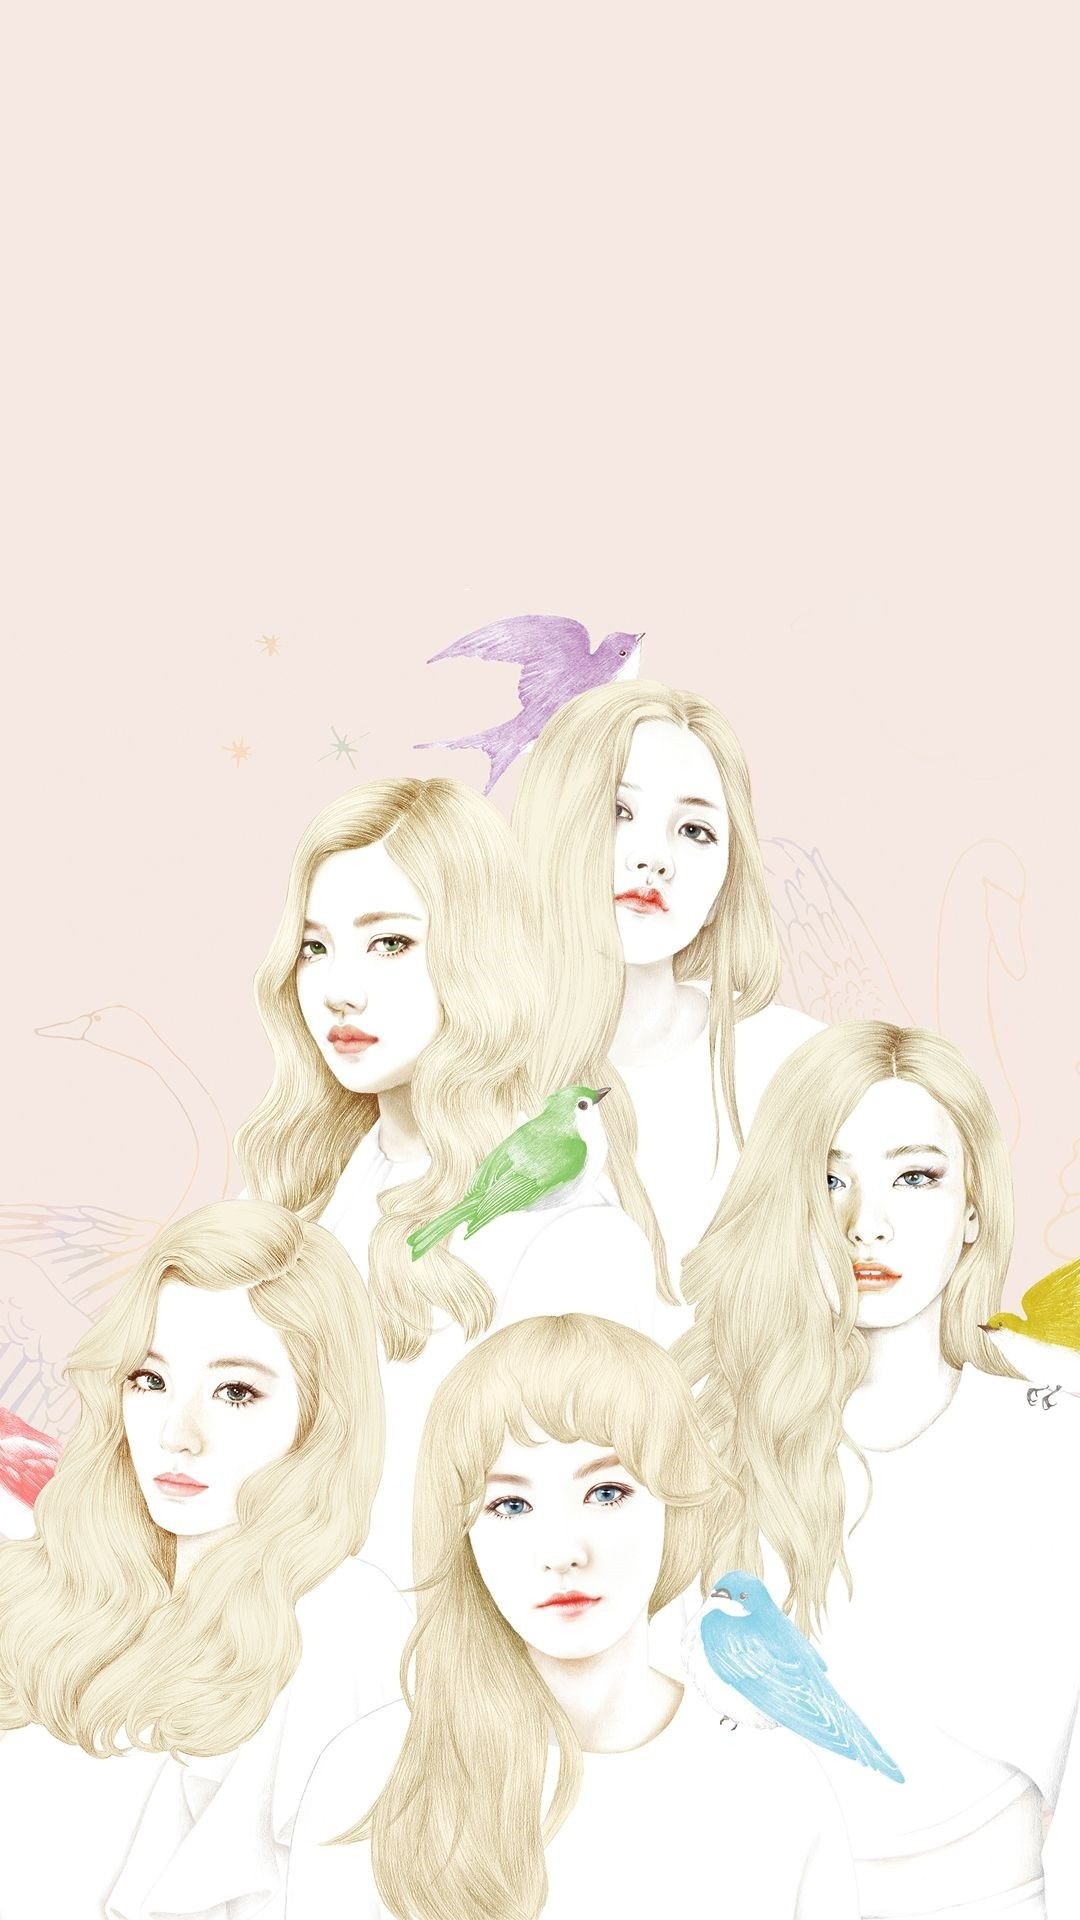 Kpop phone wallpaper